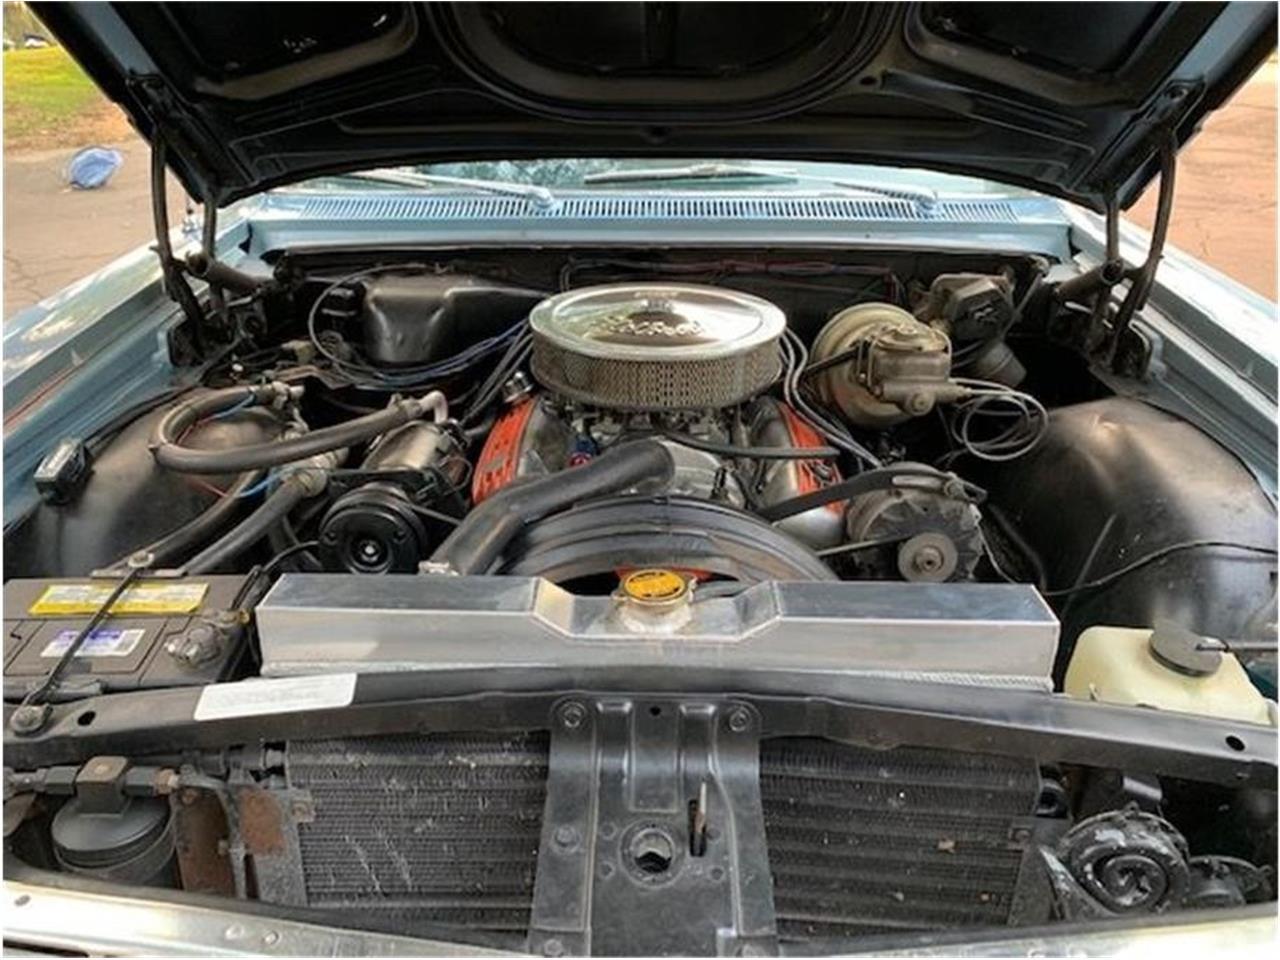 1964 Chevrolet Impala (CC-1411004) for sale in Roseville, California